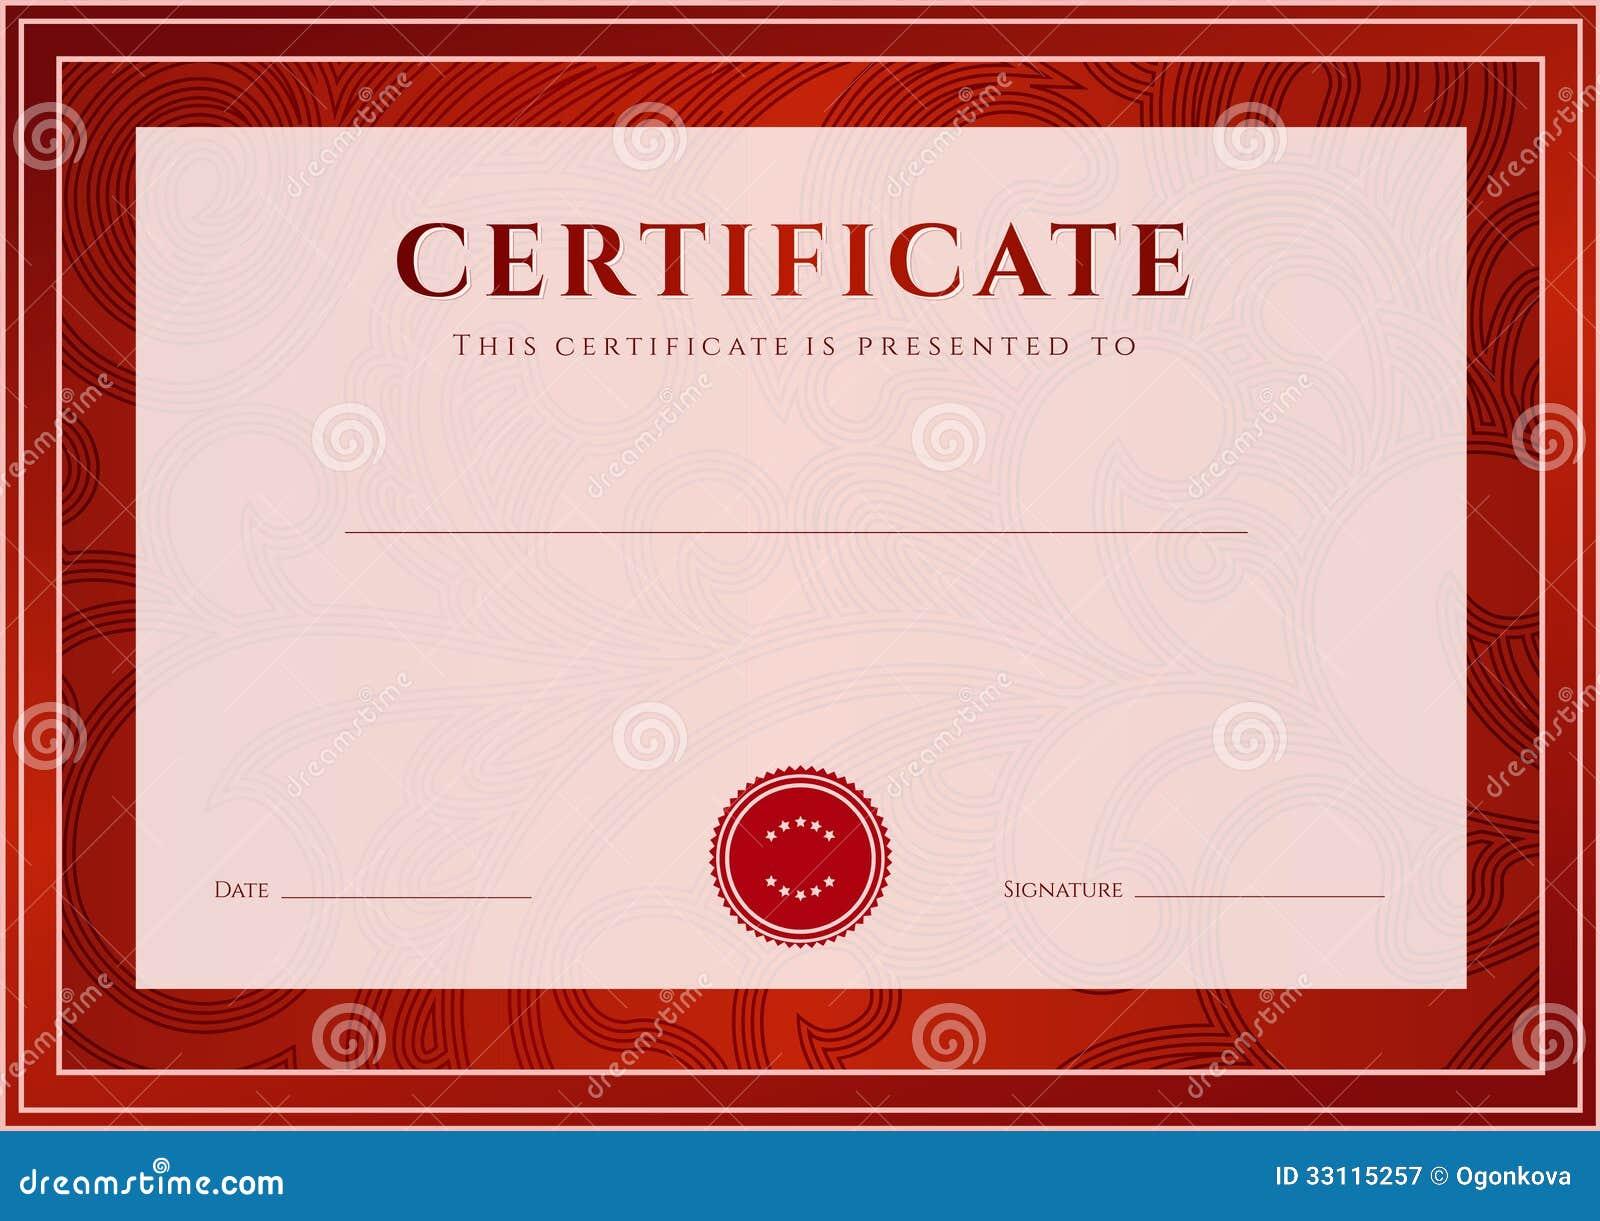 Rotes Zertifikat, Diplomschablone. Preismuster Vektor Abbildung ...